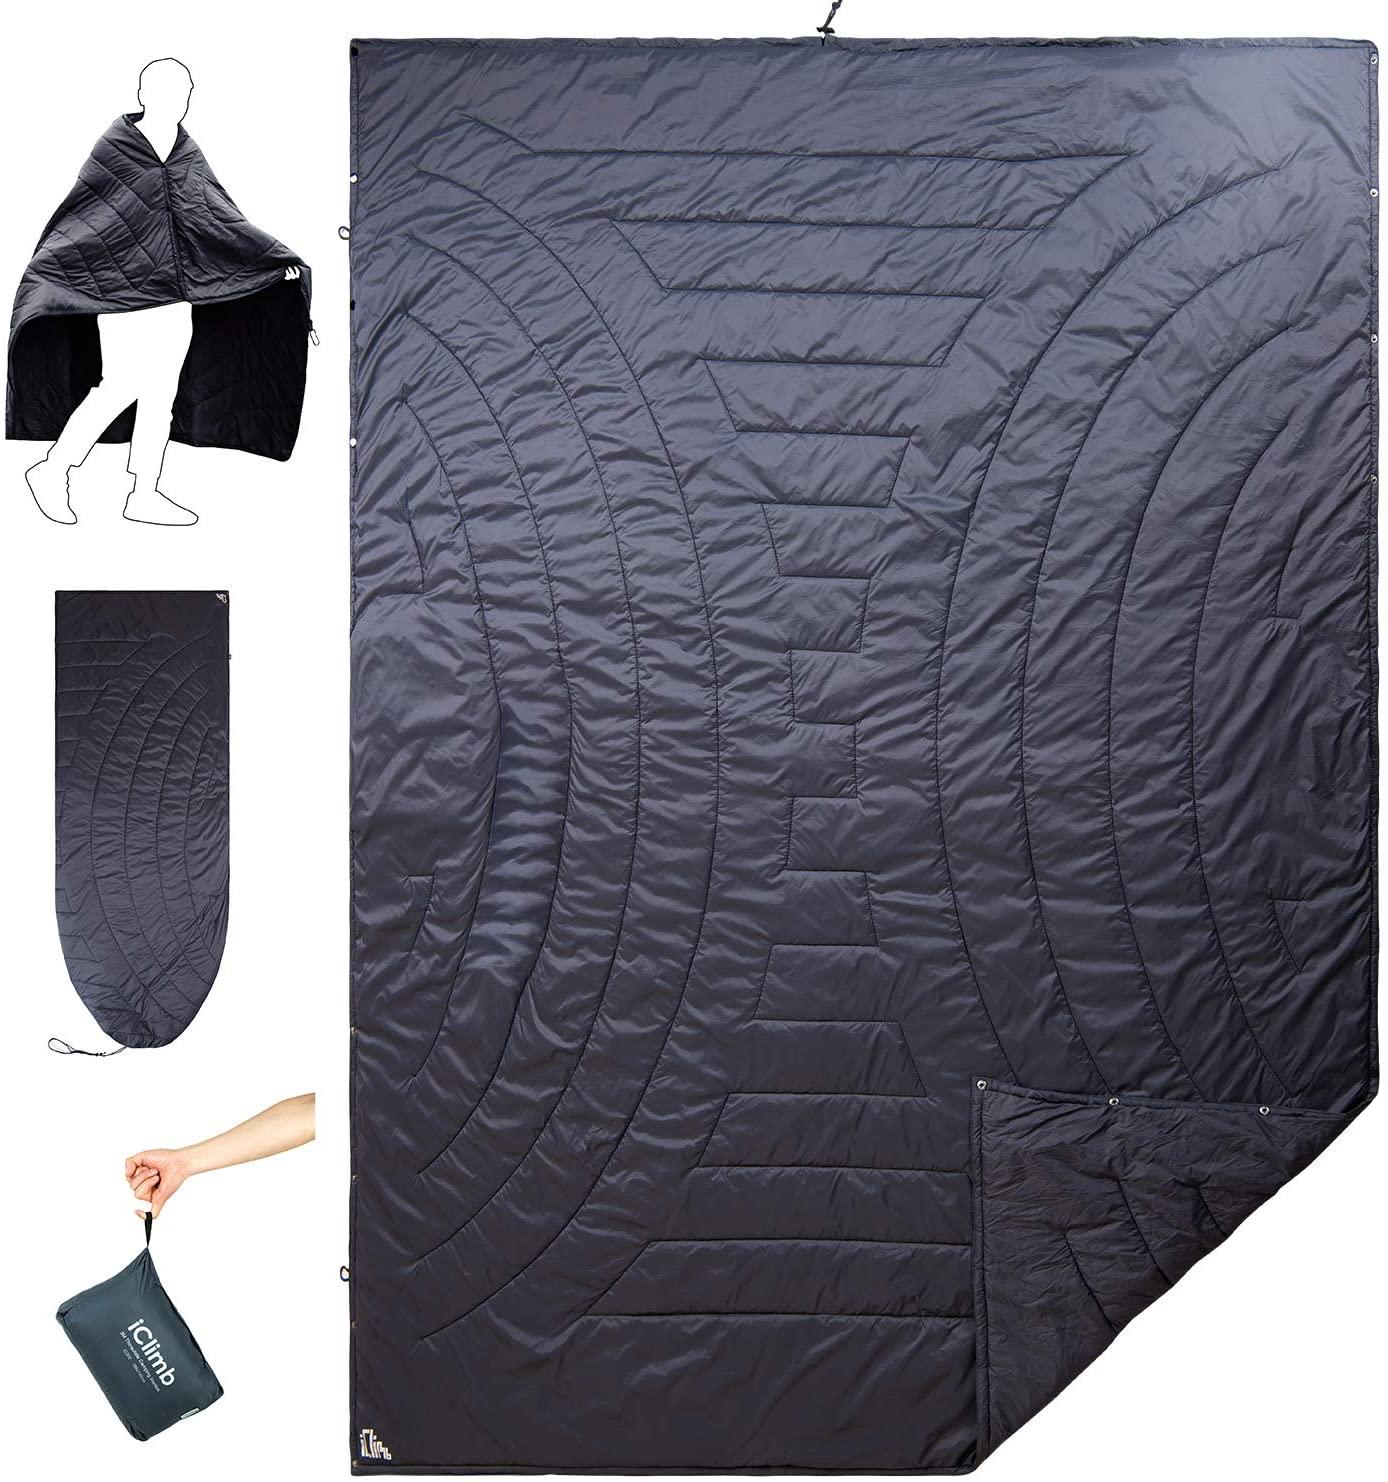 iClimb 3M Thinsulate Insulation Warm Camping Blanket Ultralight Compact